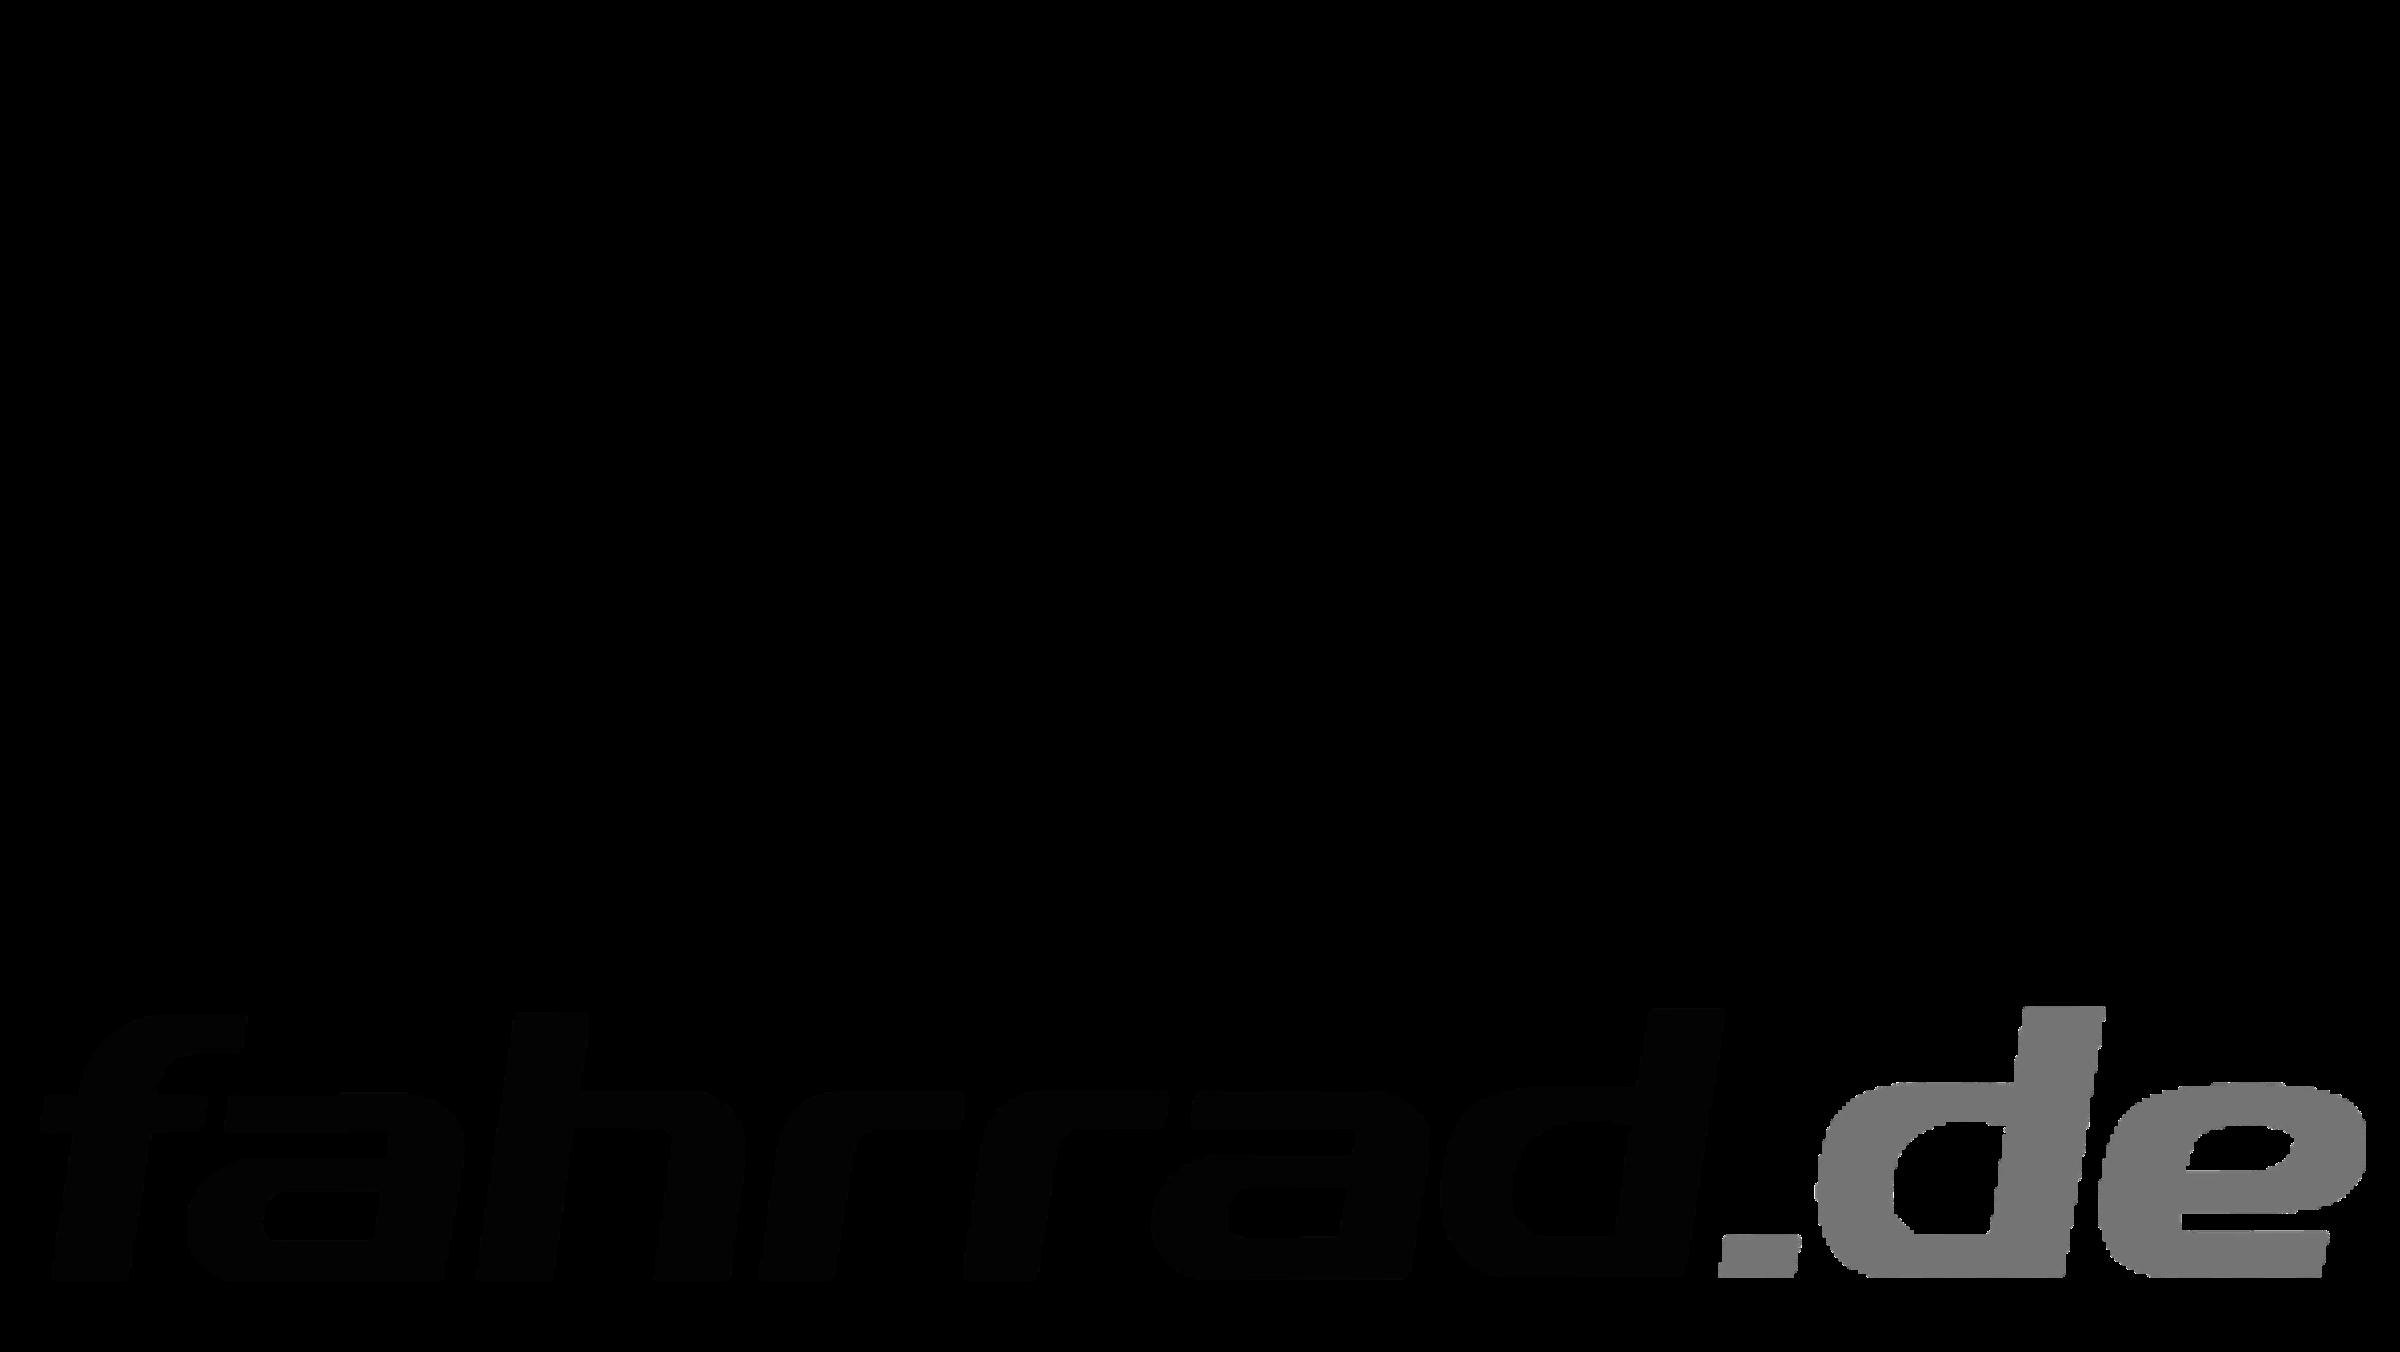 Logo Onlineshop Fahrrad.de